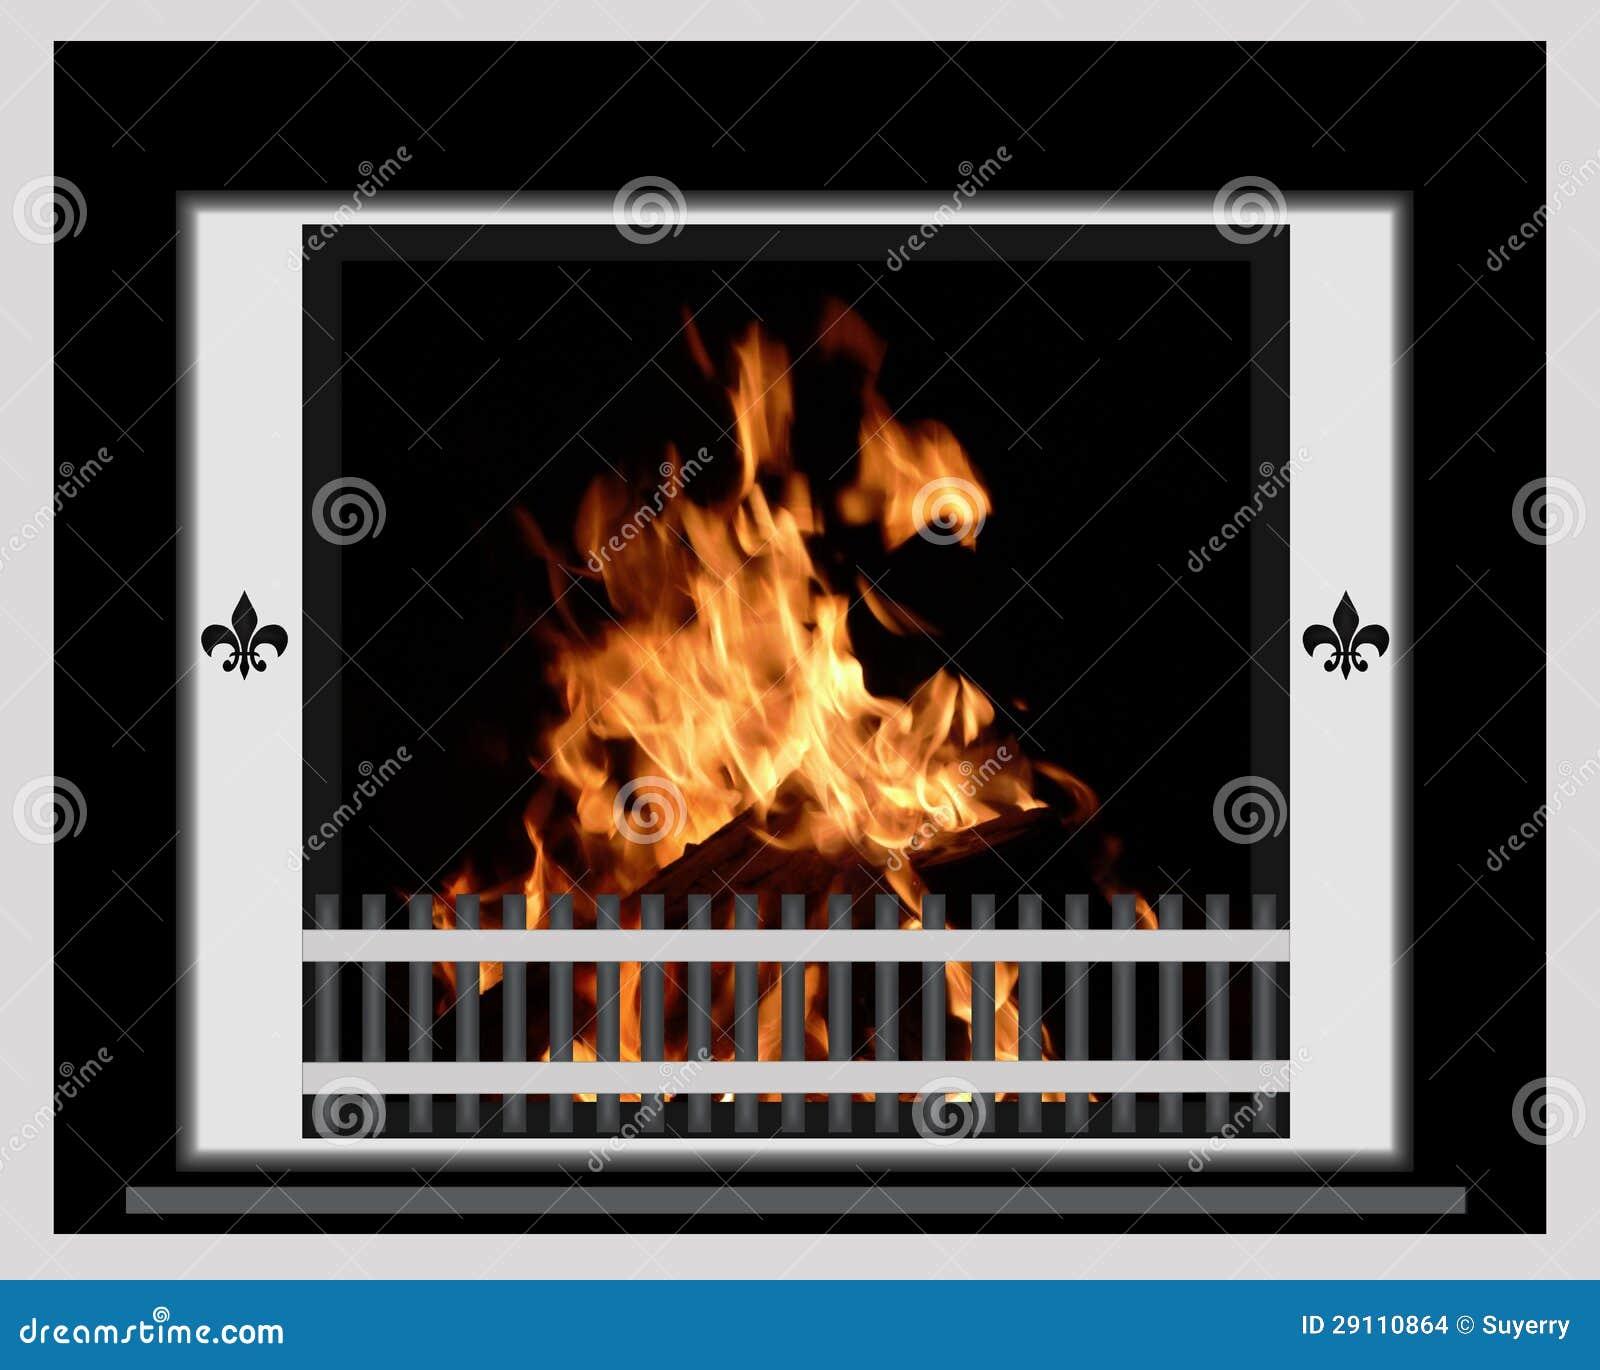 Feuer, das im Chrom-Kamin brennt